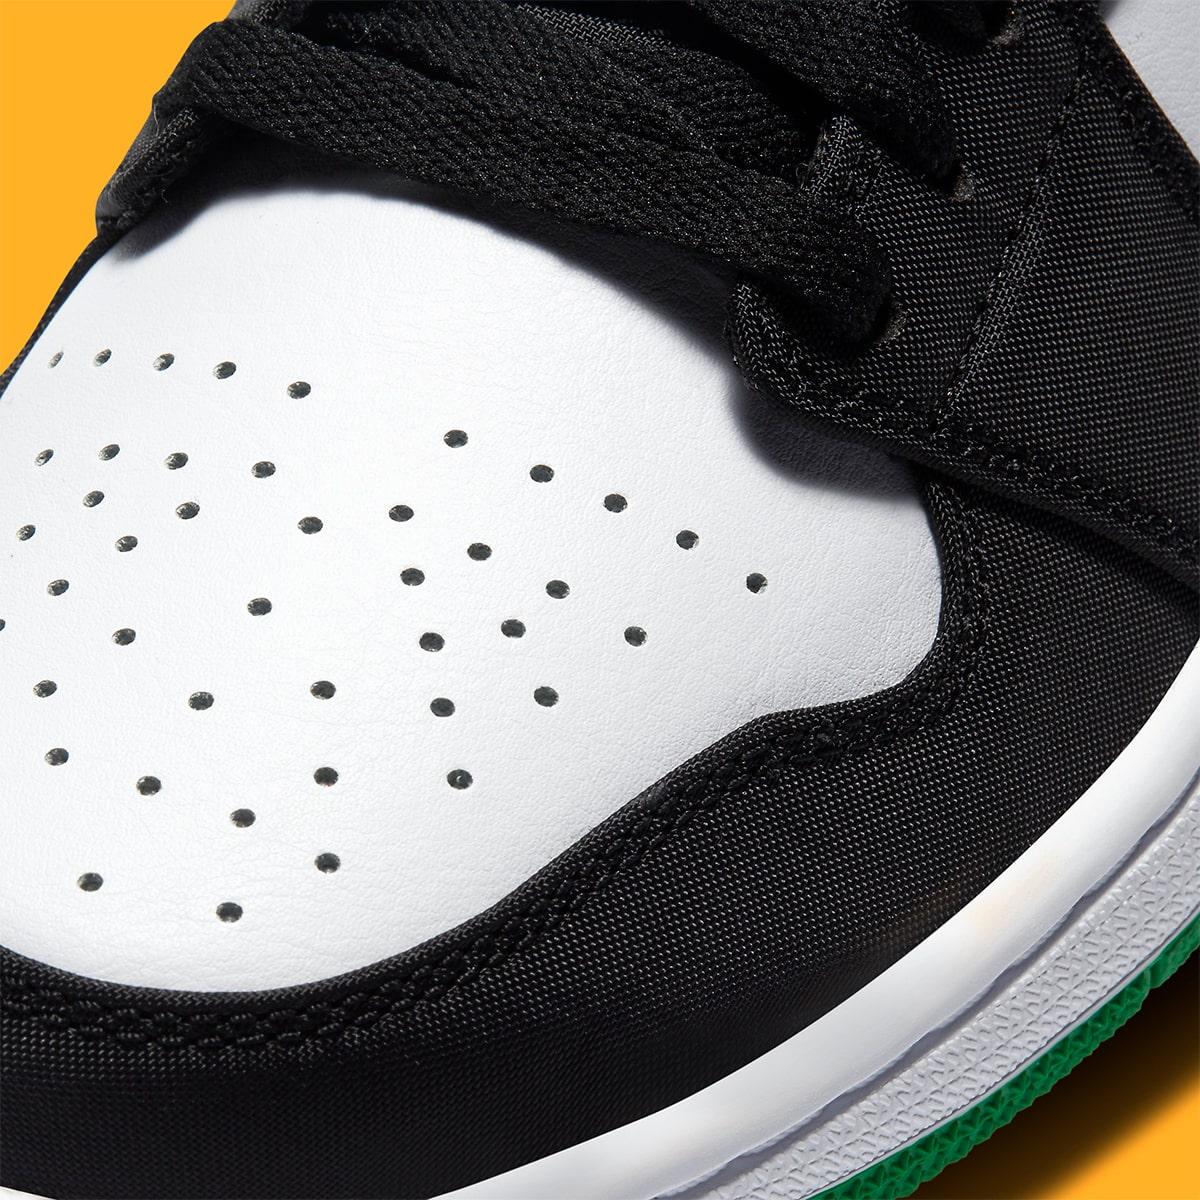 air-jordan-1-mid-se-white-black-green-laser-orange-852542-101-release-date-8